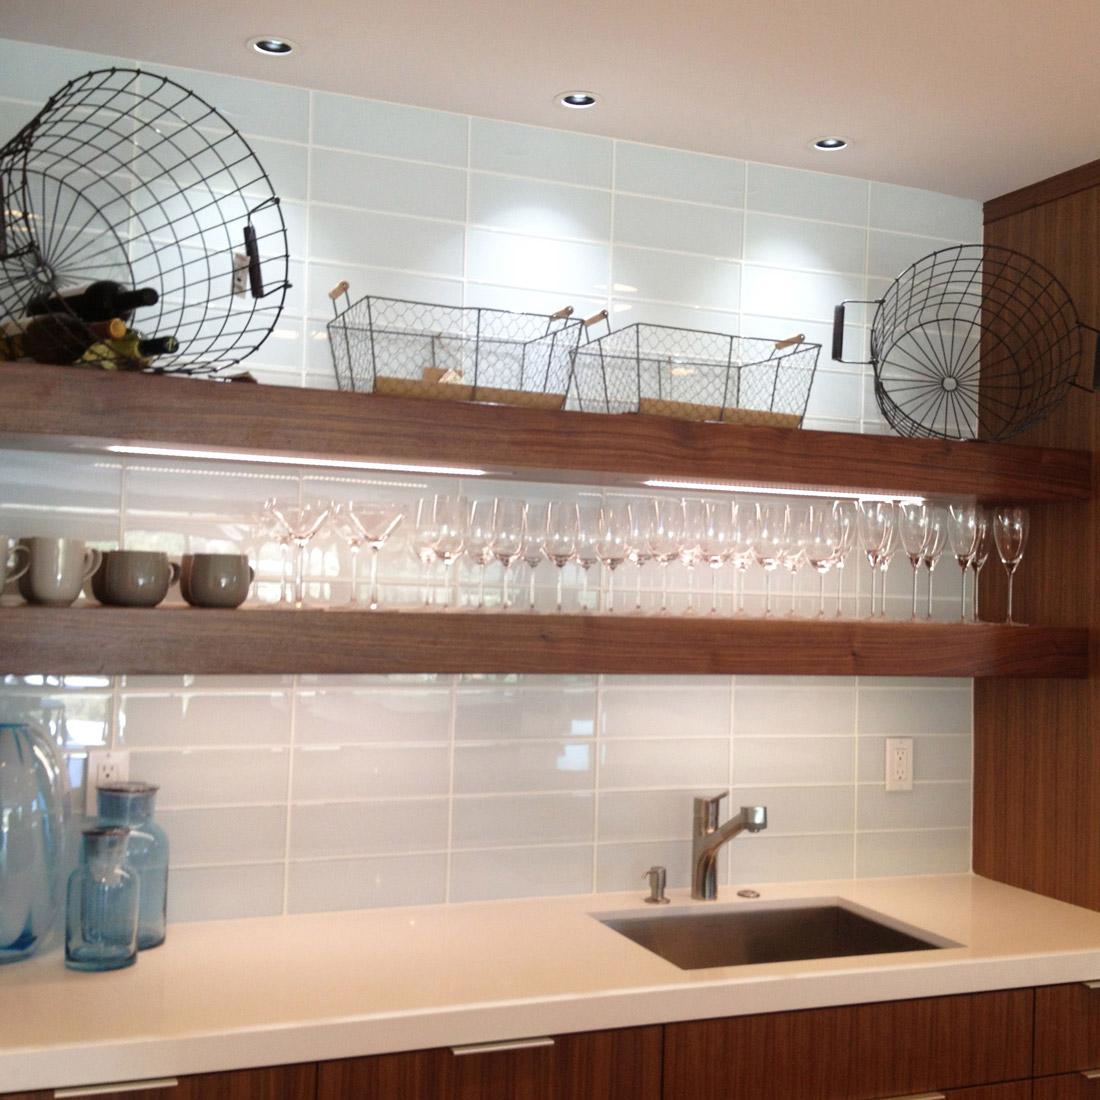 modern kitchen remodel with walnut open shelves and large format glass tile backsplash display glassware above barsink in ceasarstone white countertops design by sara bates interior design